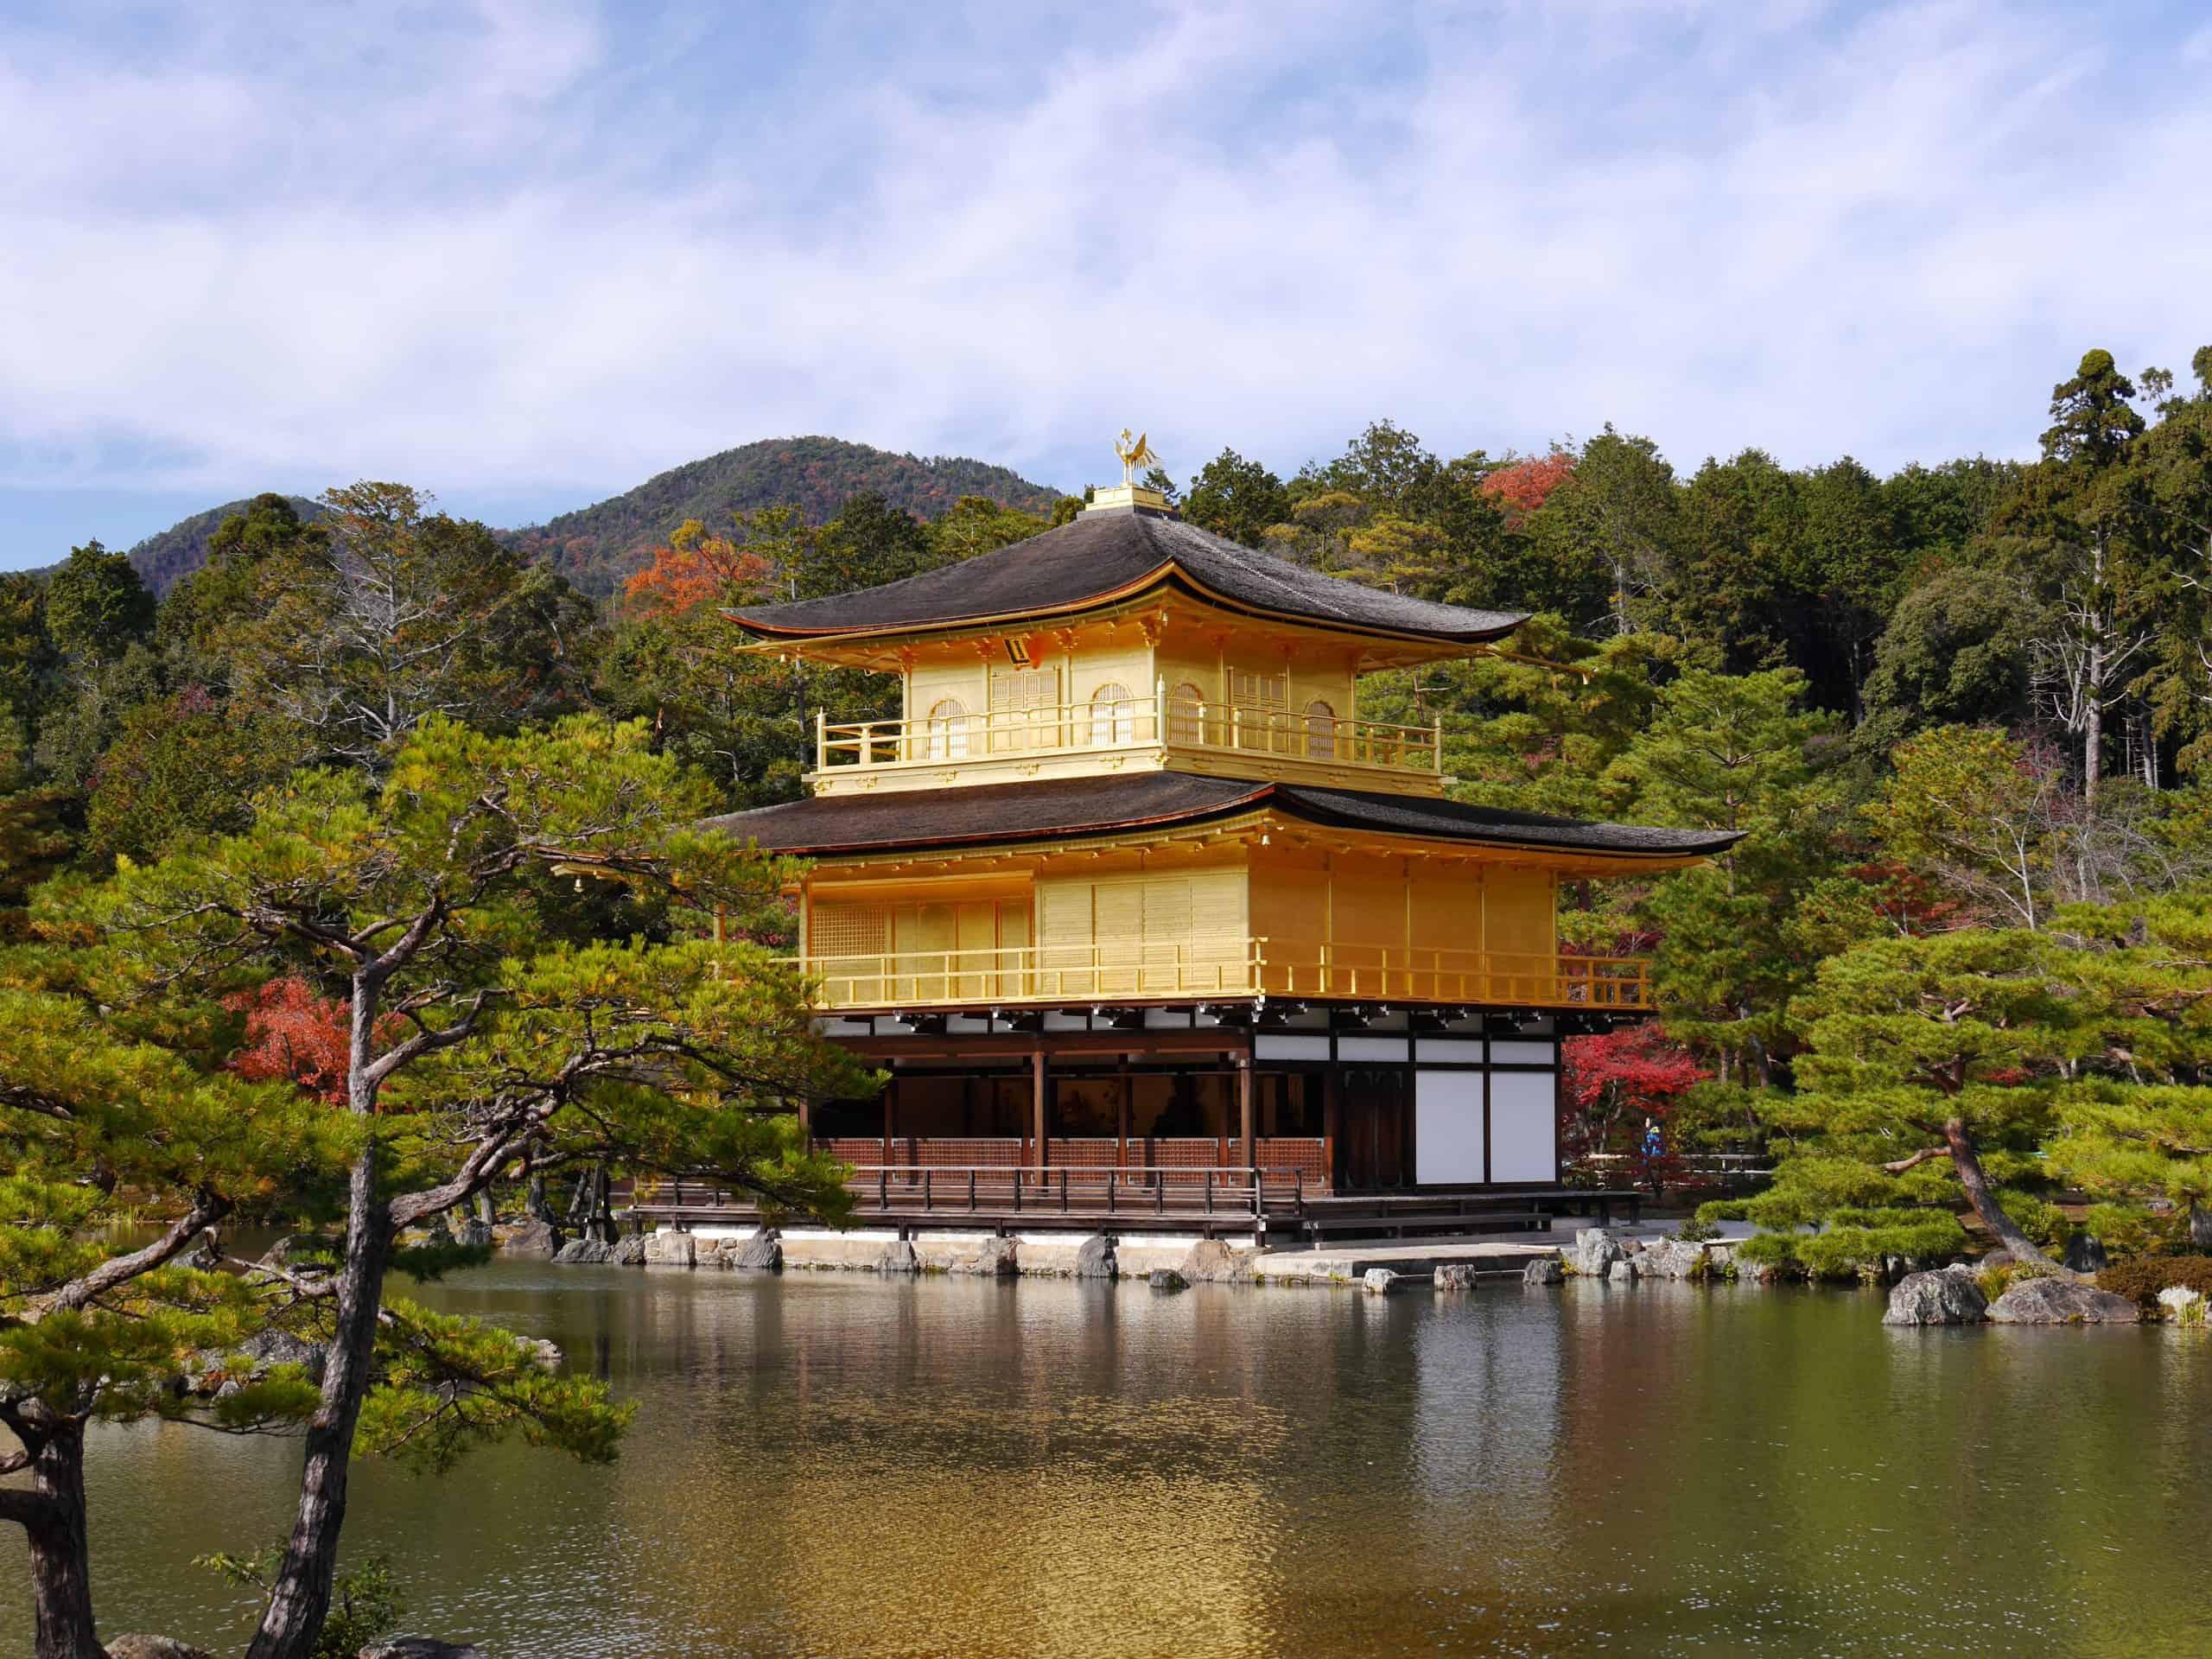 visit Kinkaku-ji